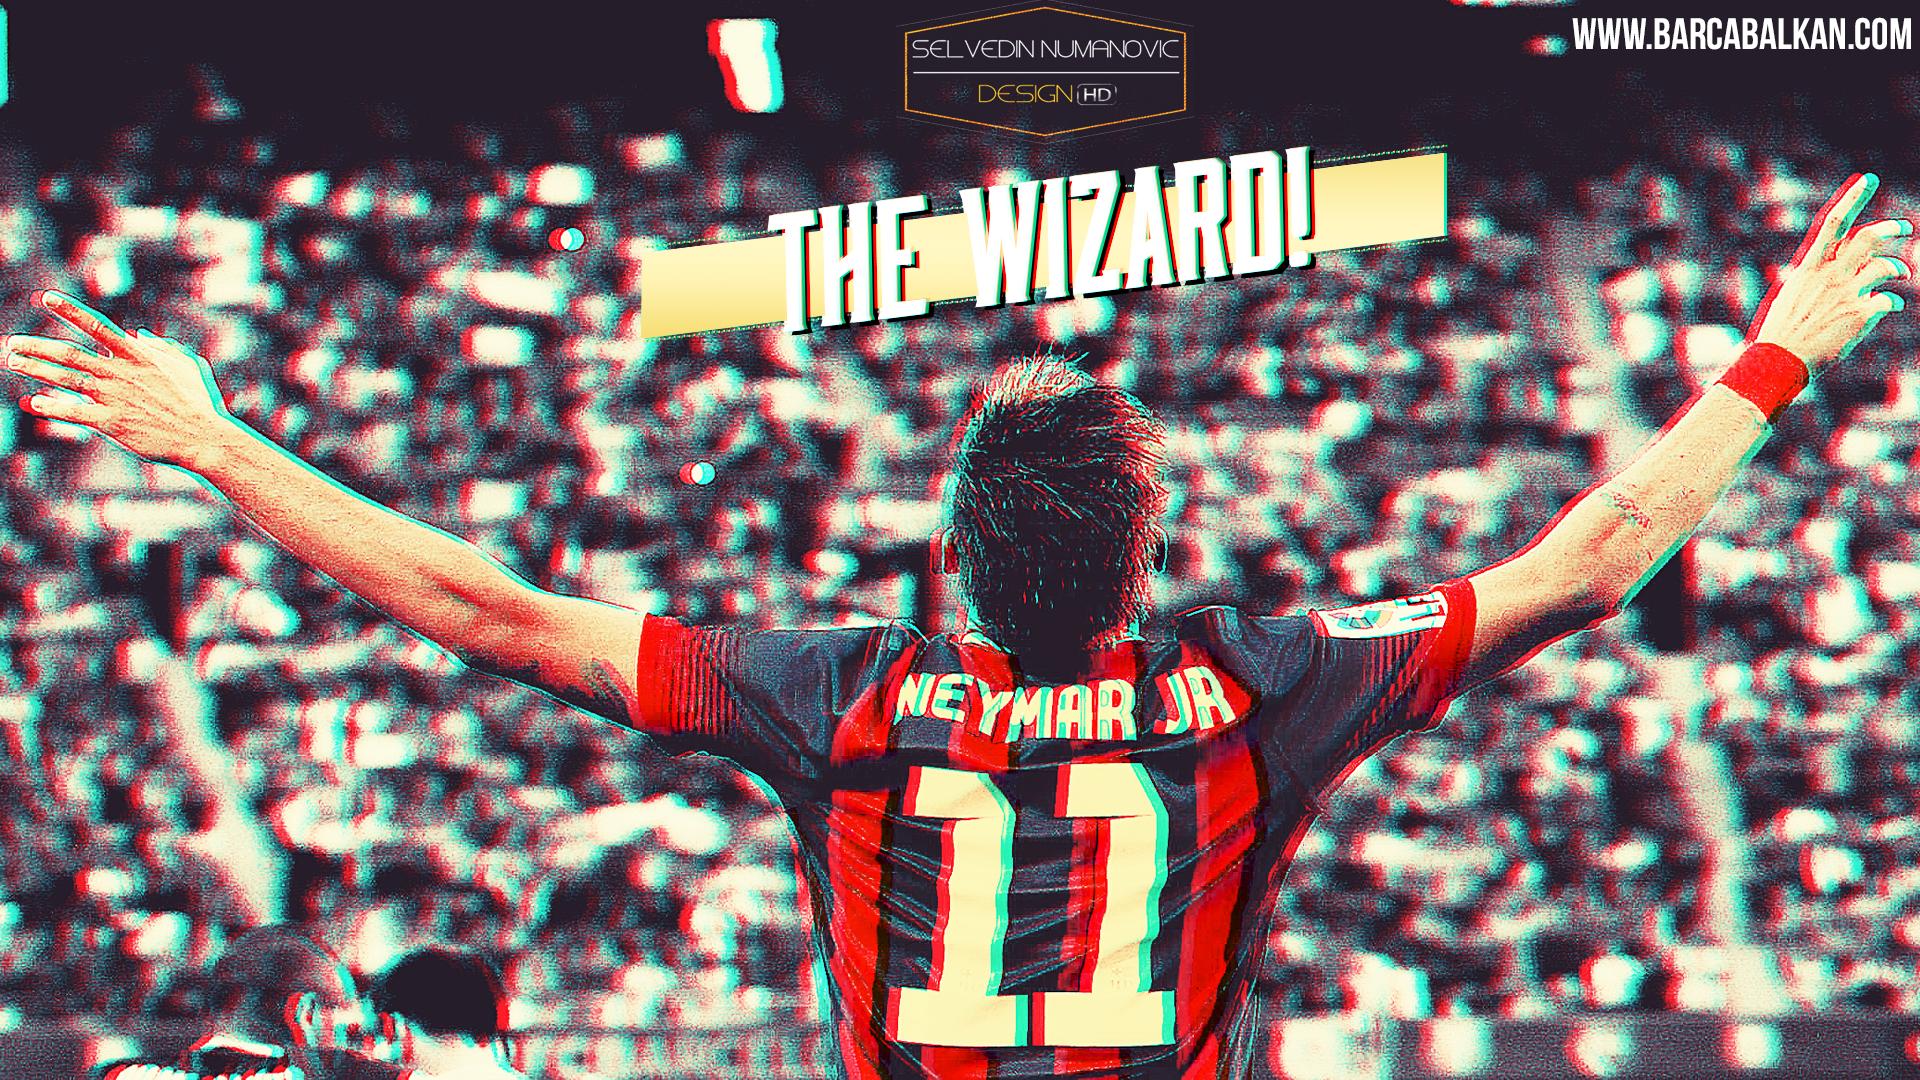 Neymar Jr wallpaper FC Barcelona 2014 HD by SelvedinFCB on DeviantArt